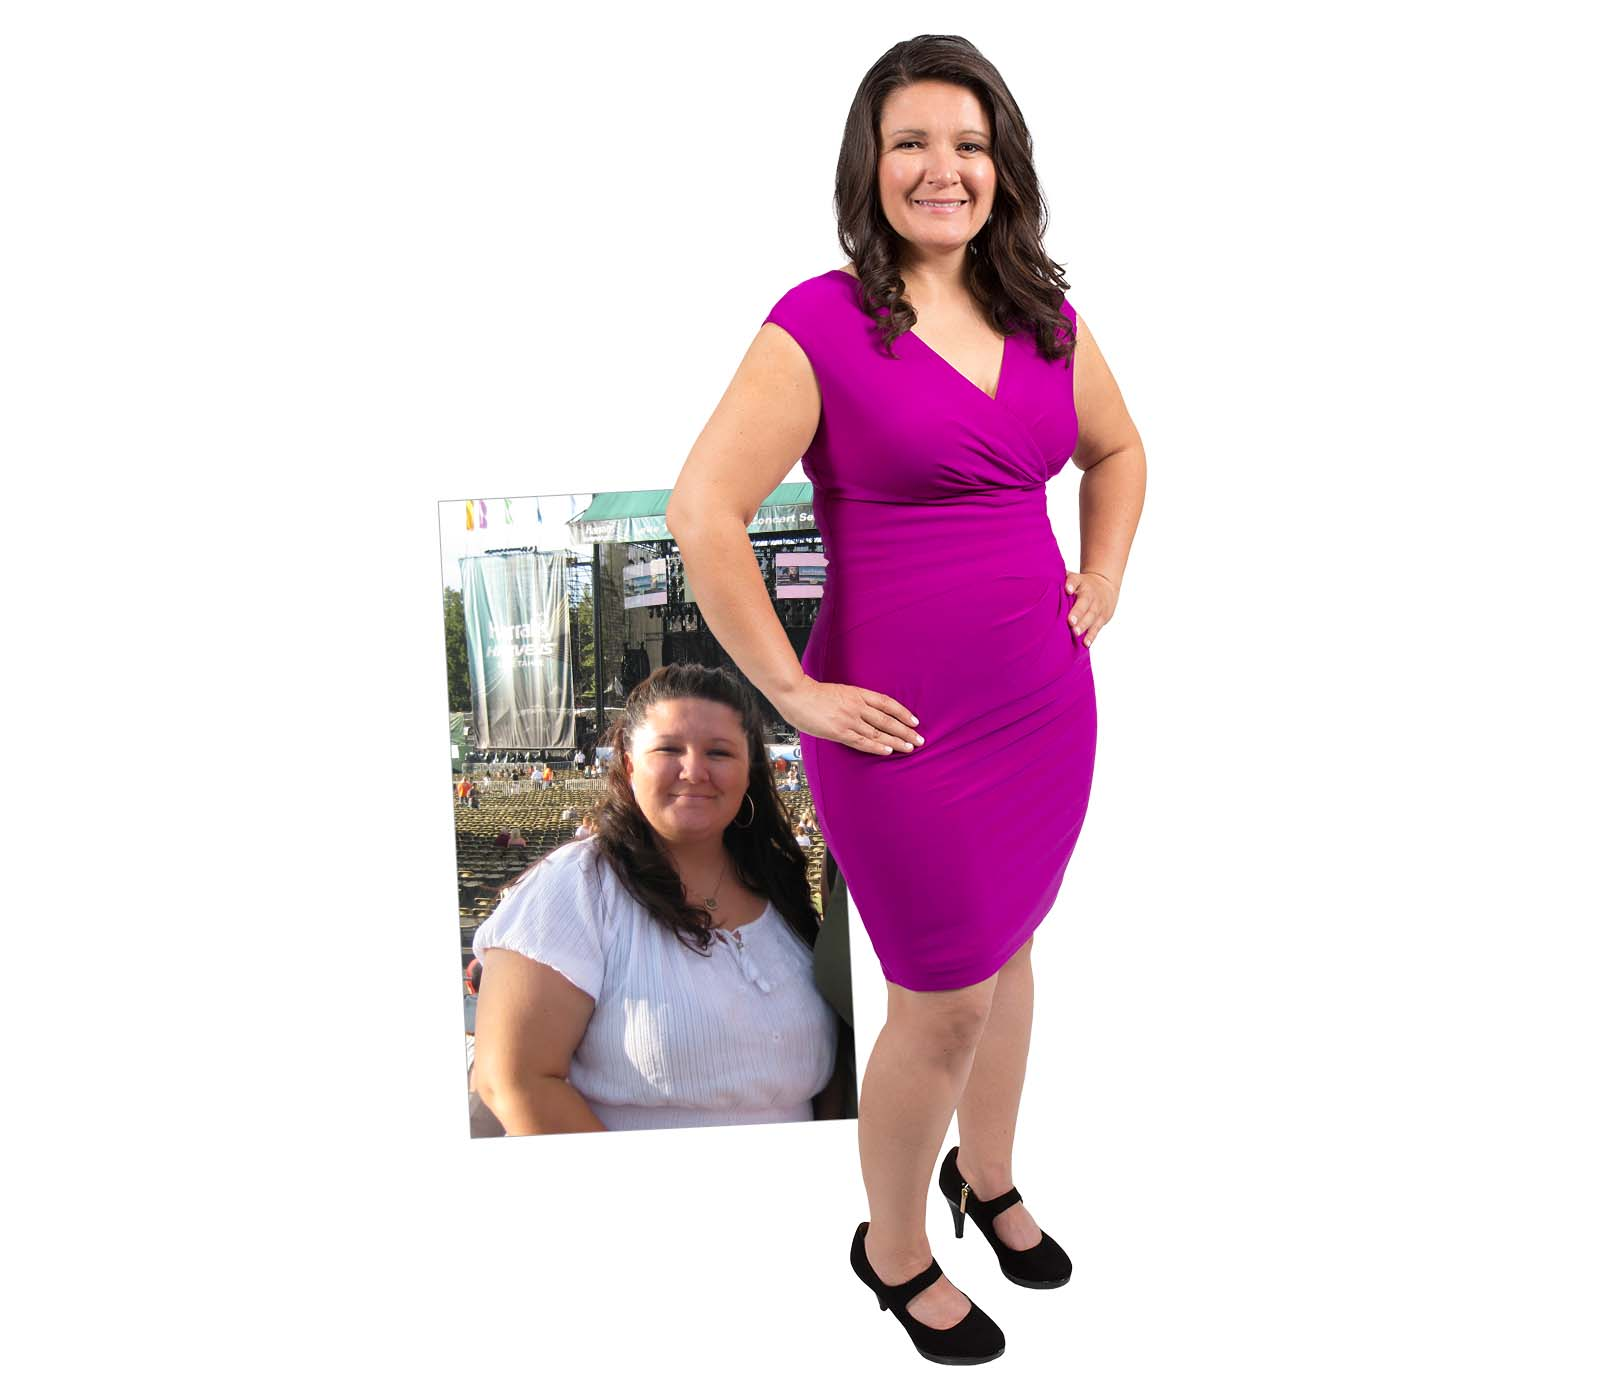 Hmr Program Named No 1 Best Fast Weight Loss Diet By U